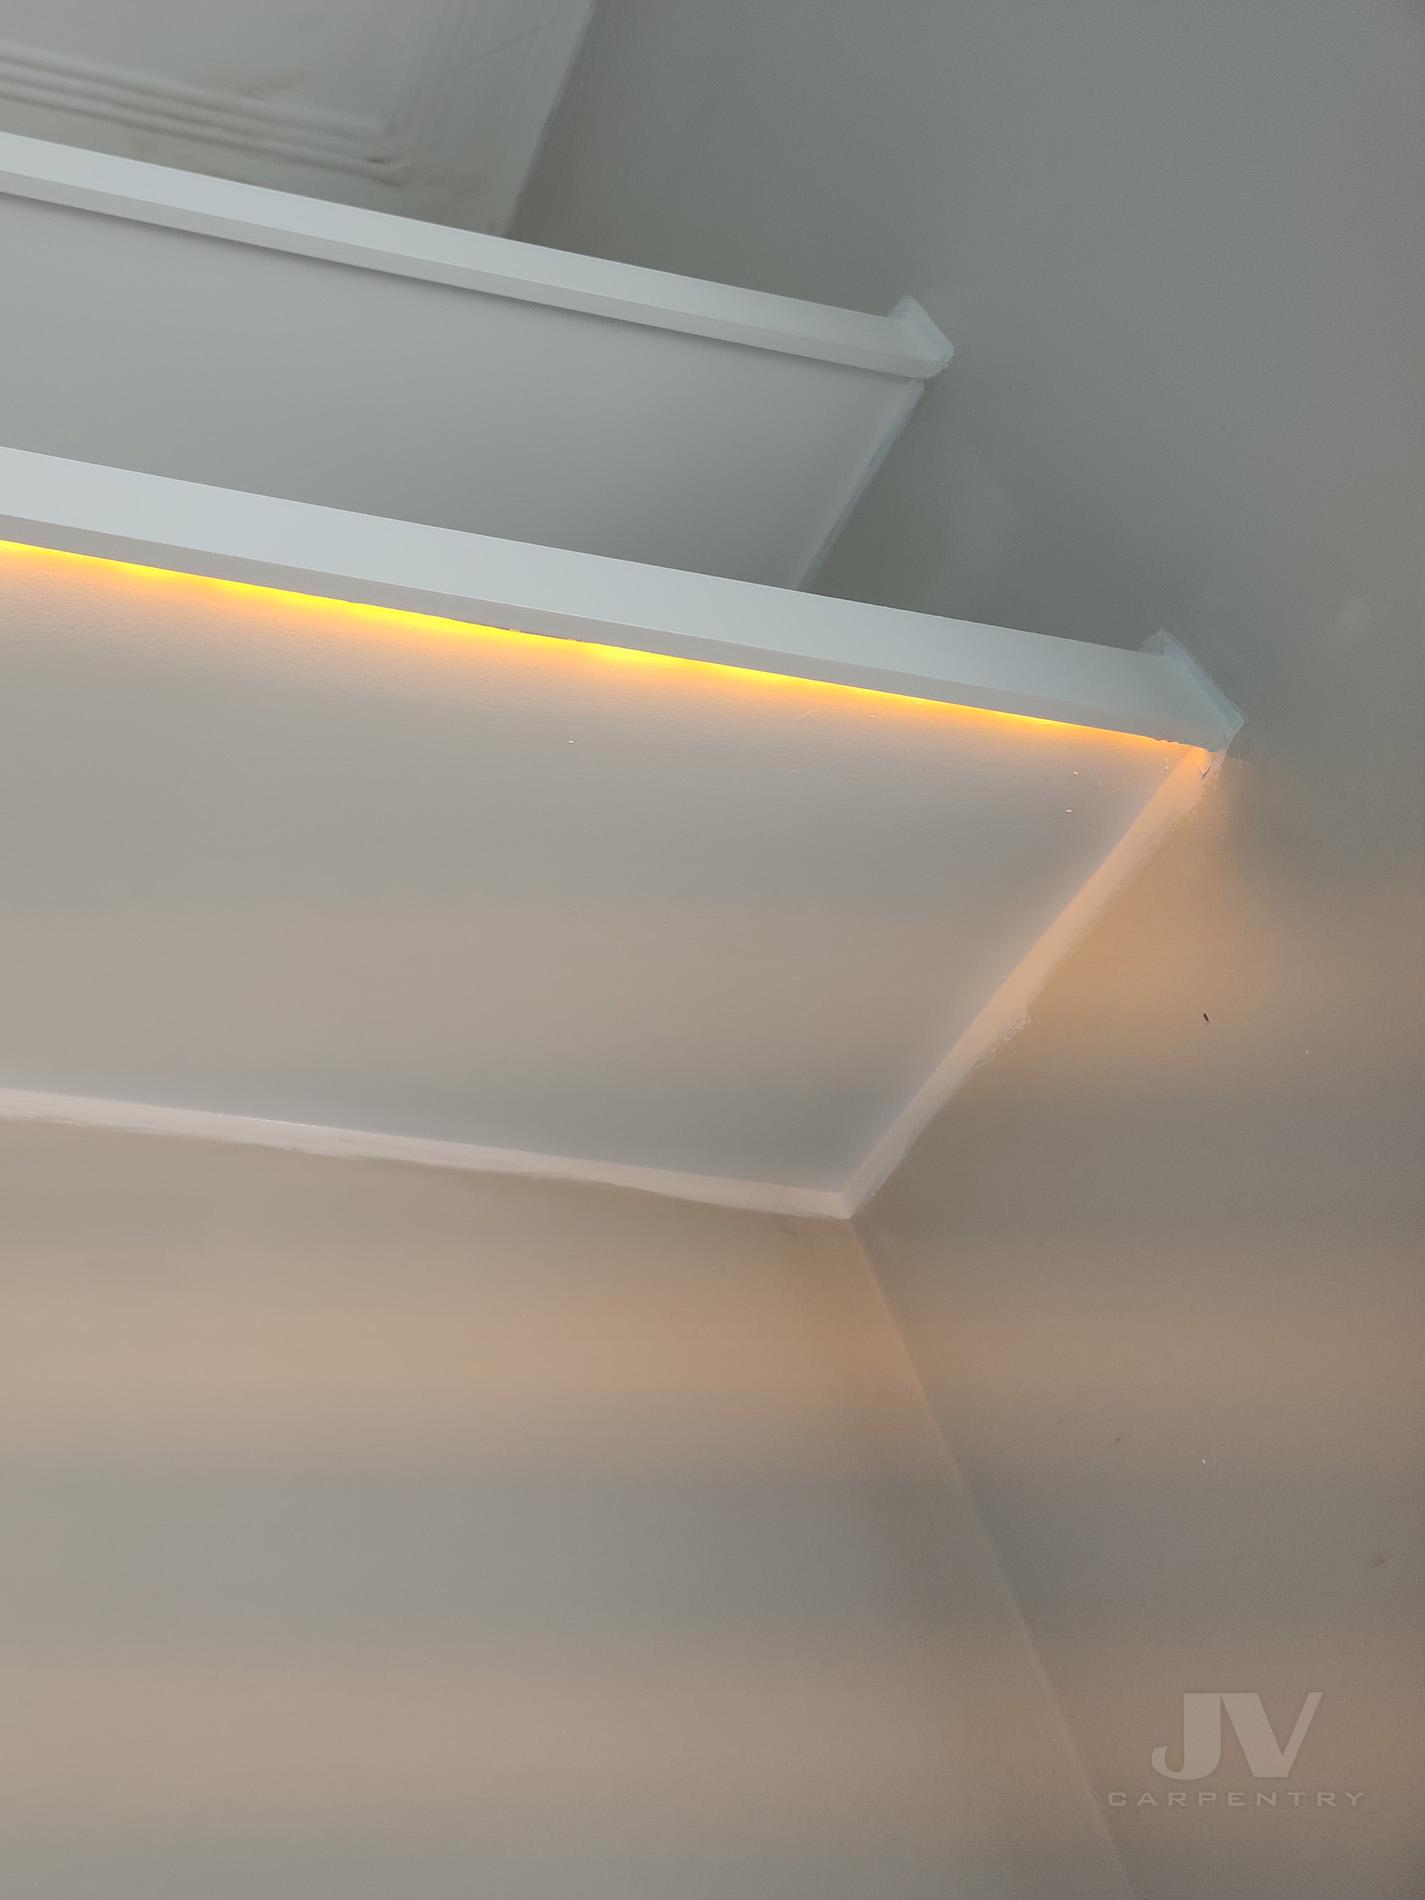 led light underneath floating shelf in alcove